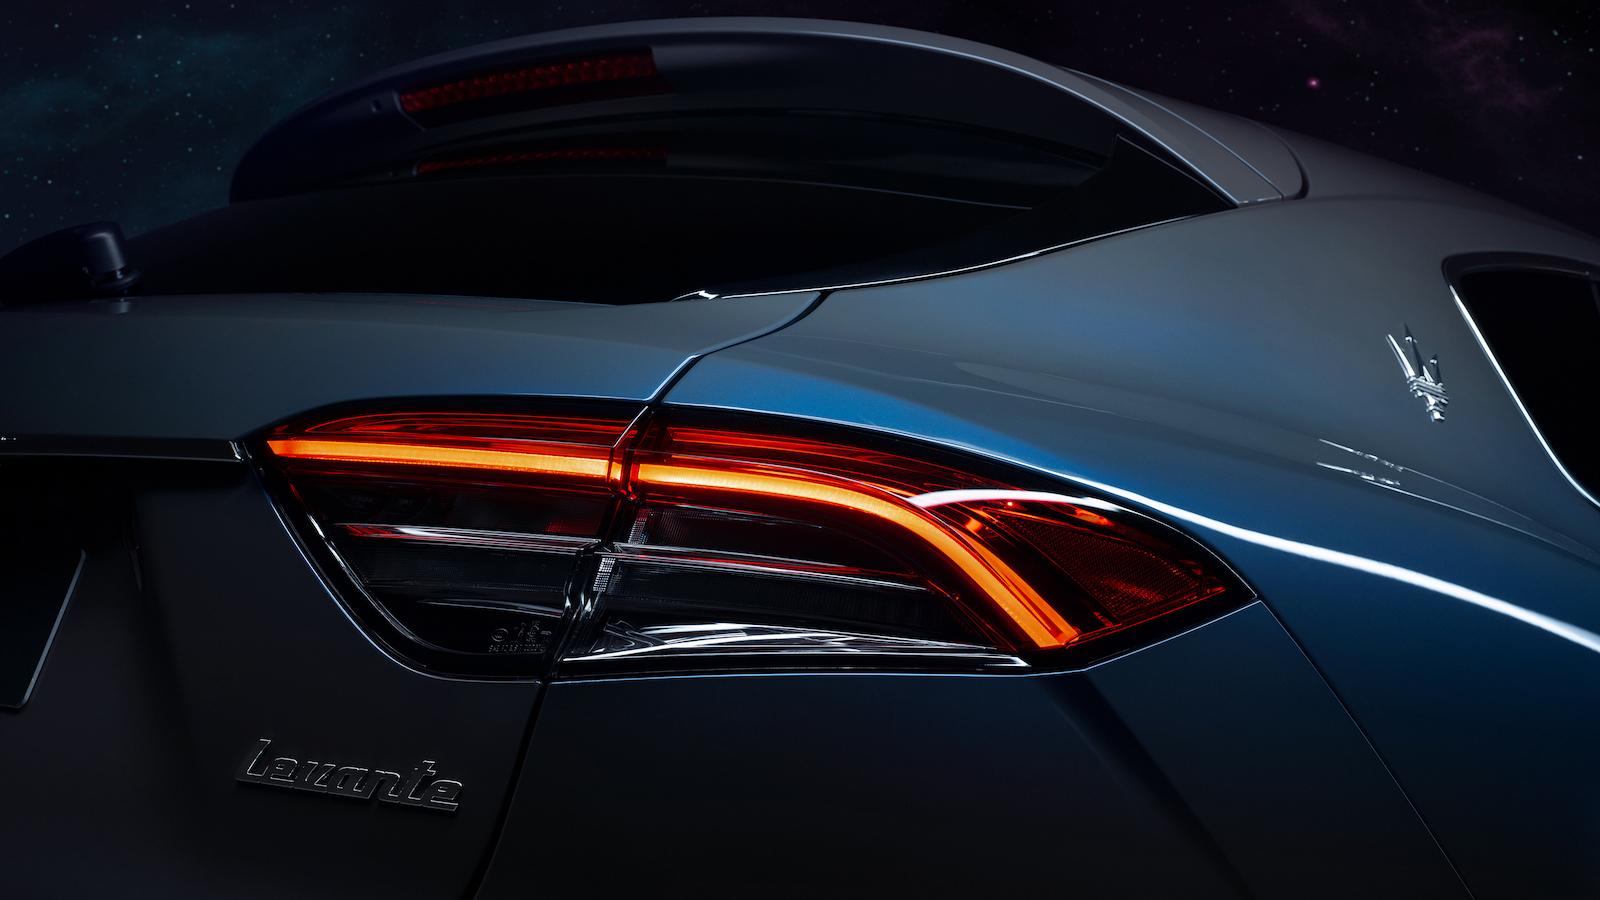 Maserati Levante 2.0 正式亮相 換裝 48V 輕油電系統